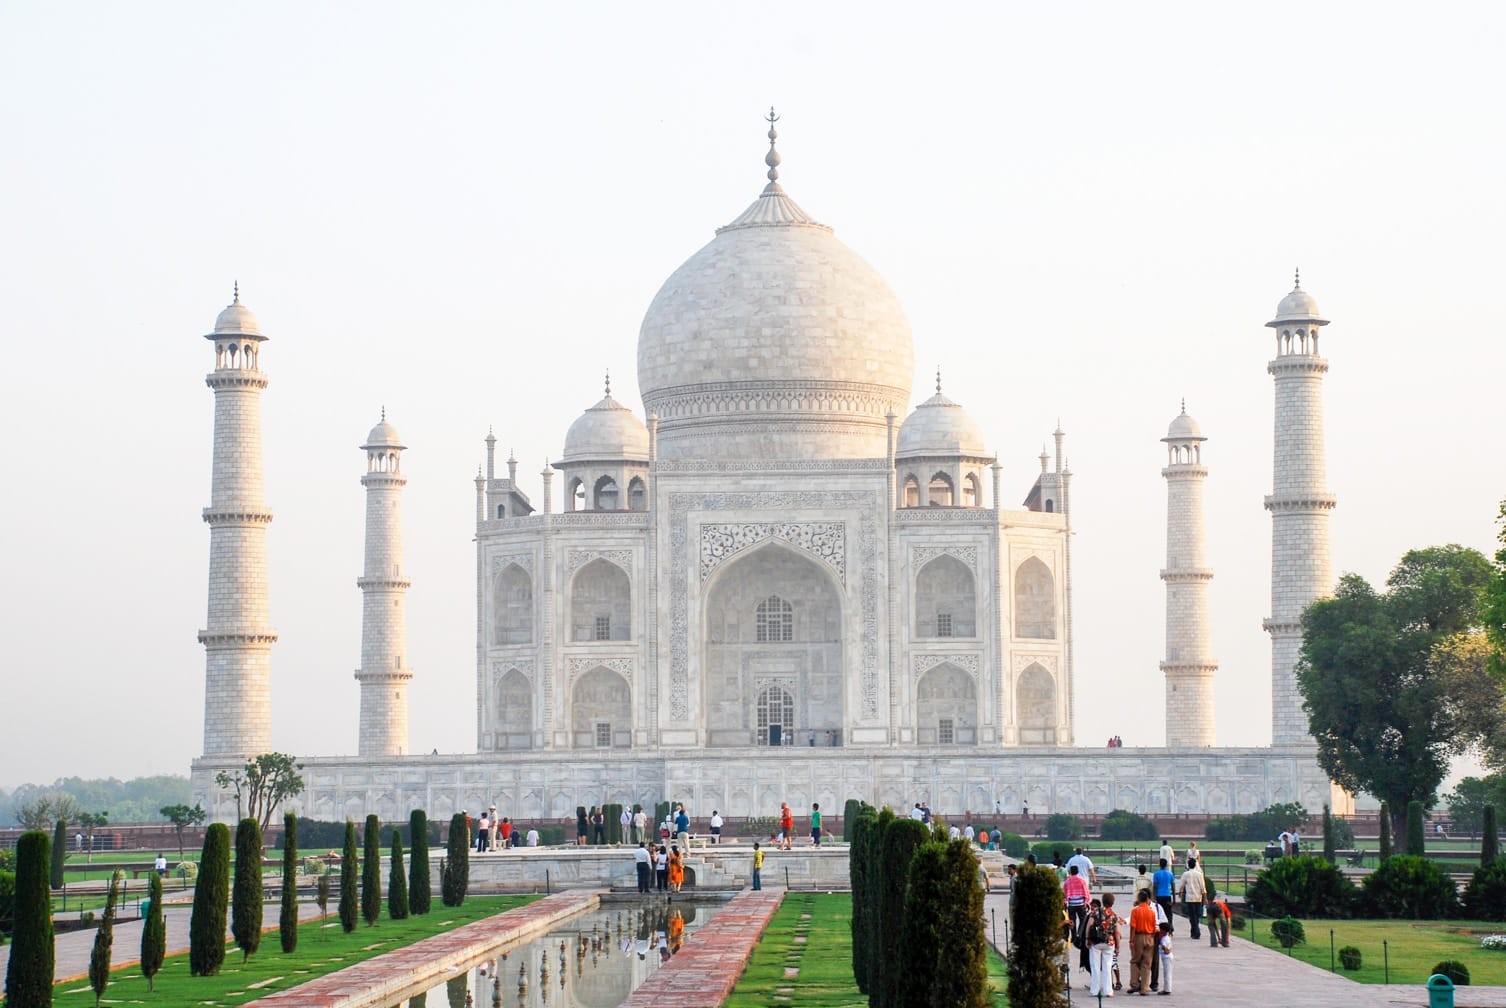 Taj Mahal on the Darjeeling Mail: Mumbai to Kolkata by Luxury Deccan Odyssey Train journey